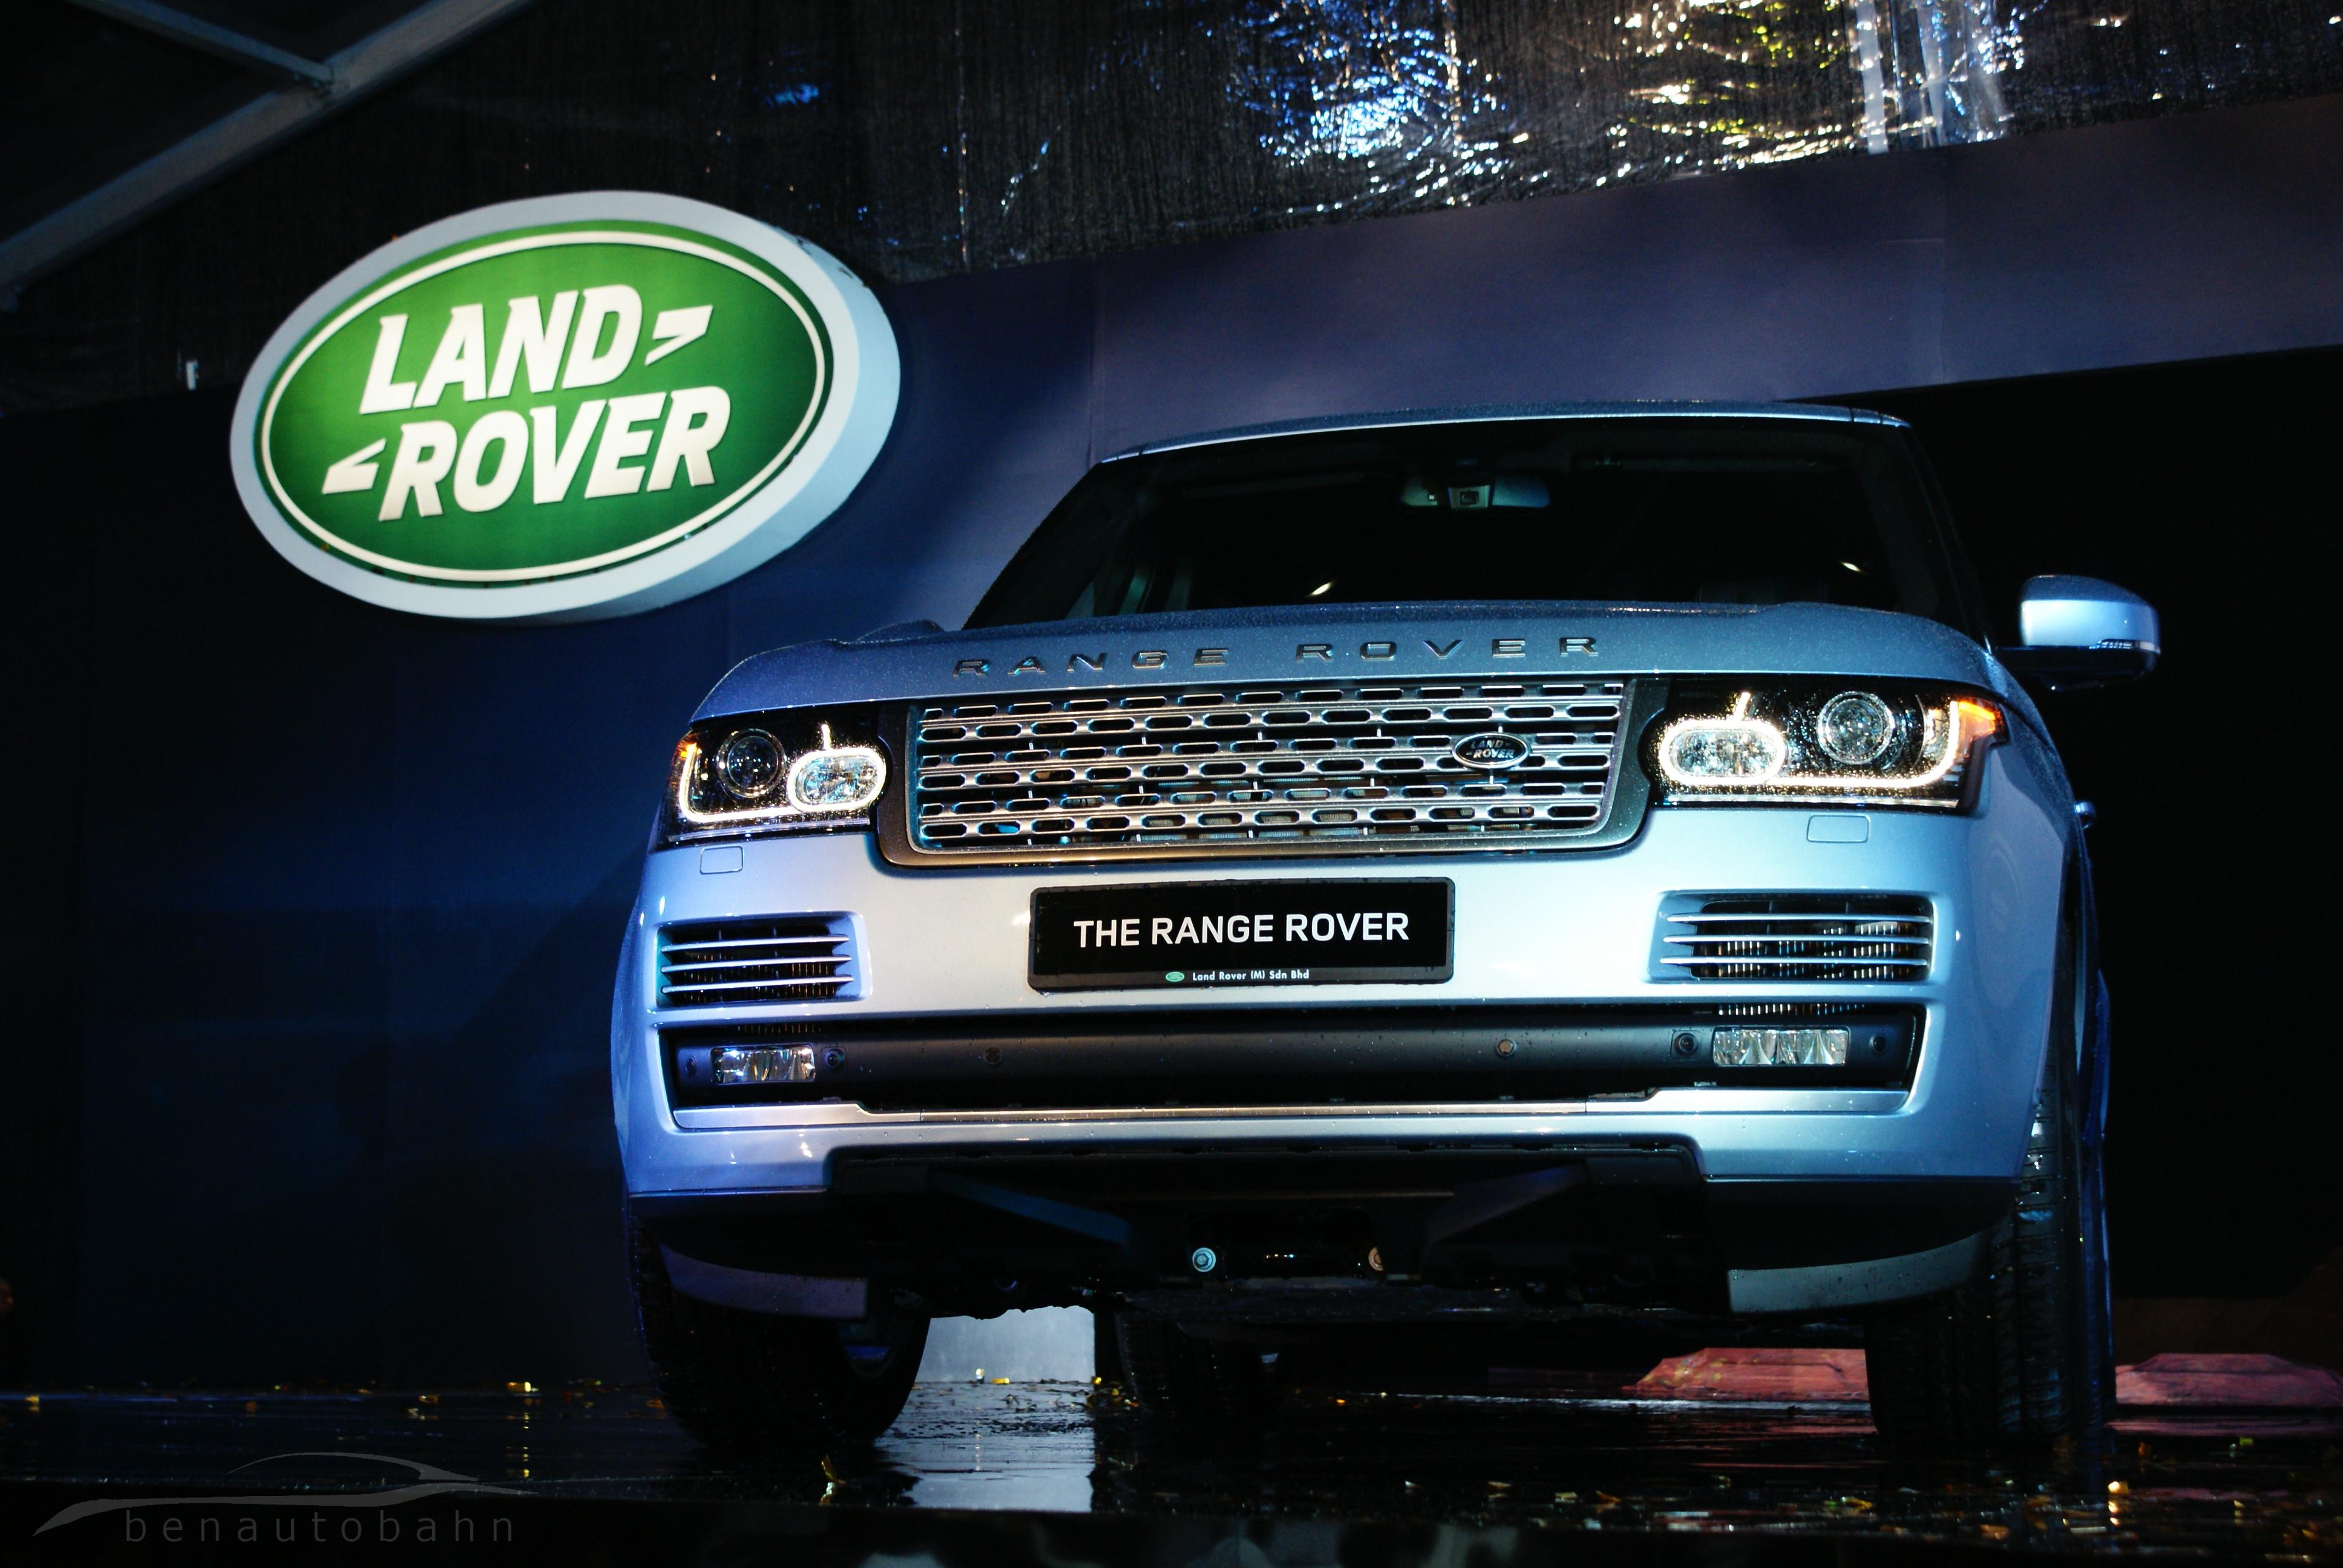 Range Rover media launch event